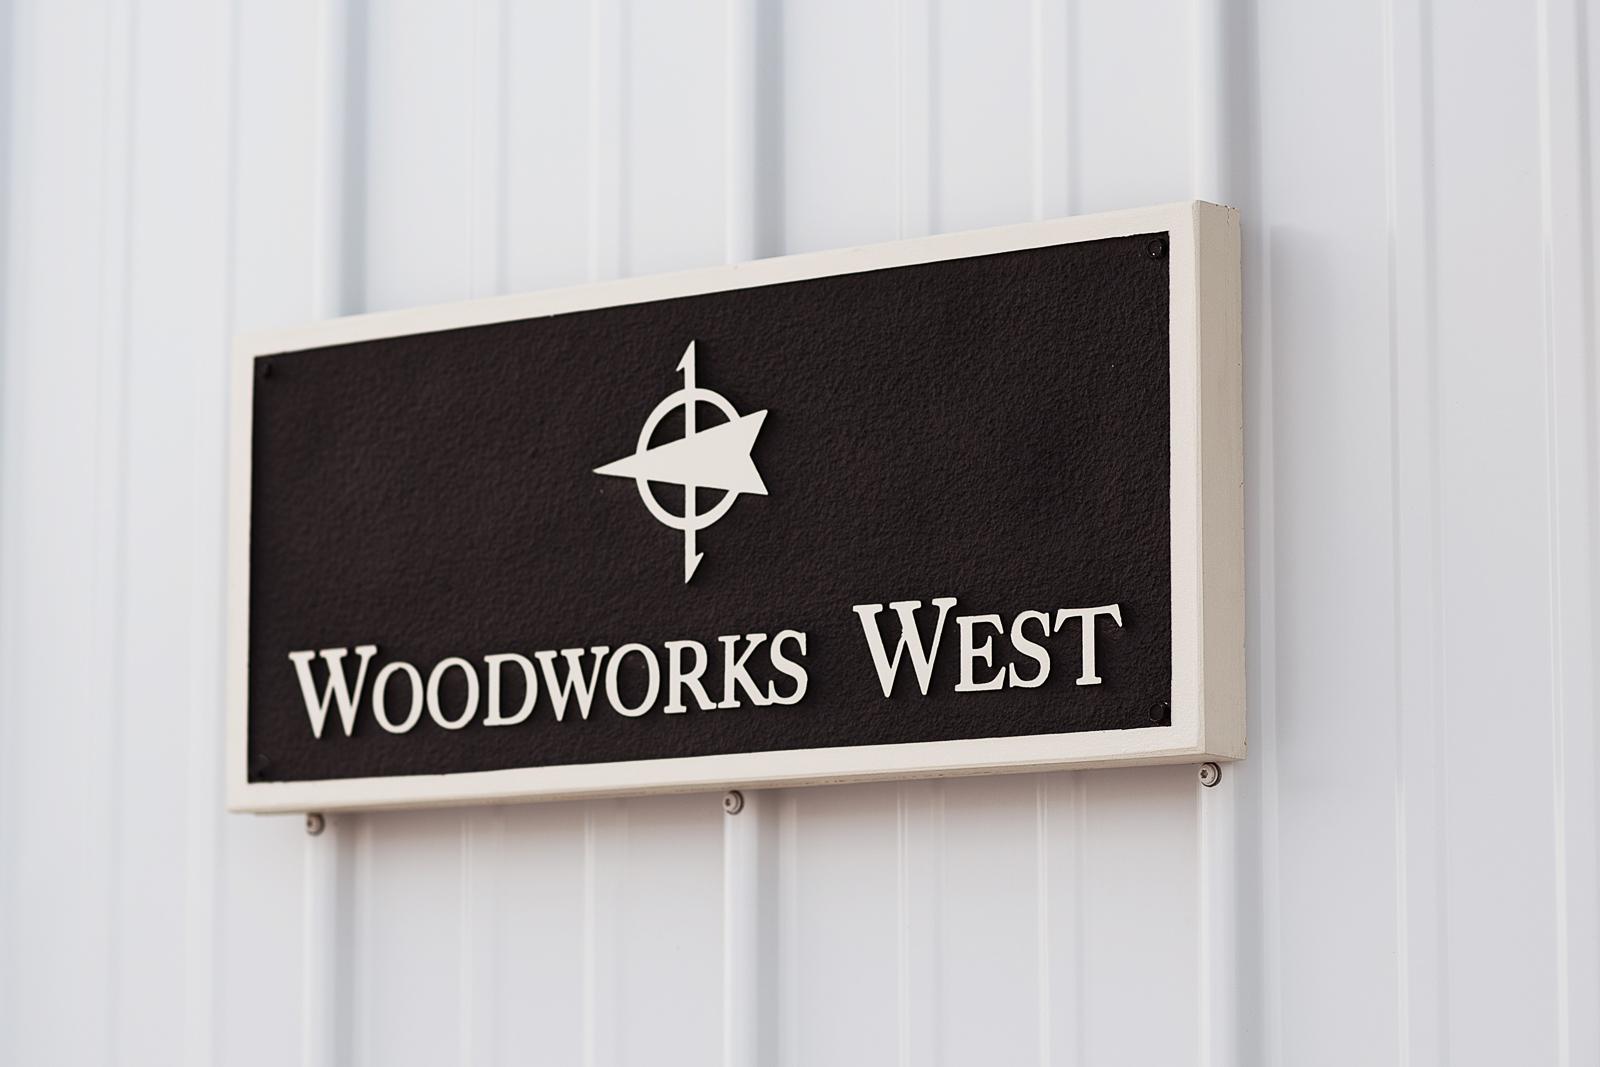 Woodworks-West-Bozeman-Montana-Builder-Cabinetry-Remodel-New-Construction-3766-2.jpg